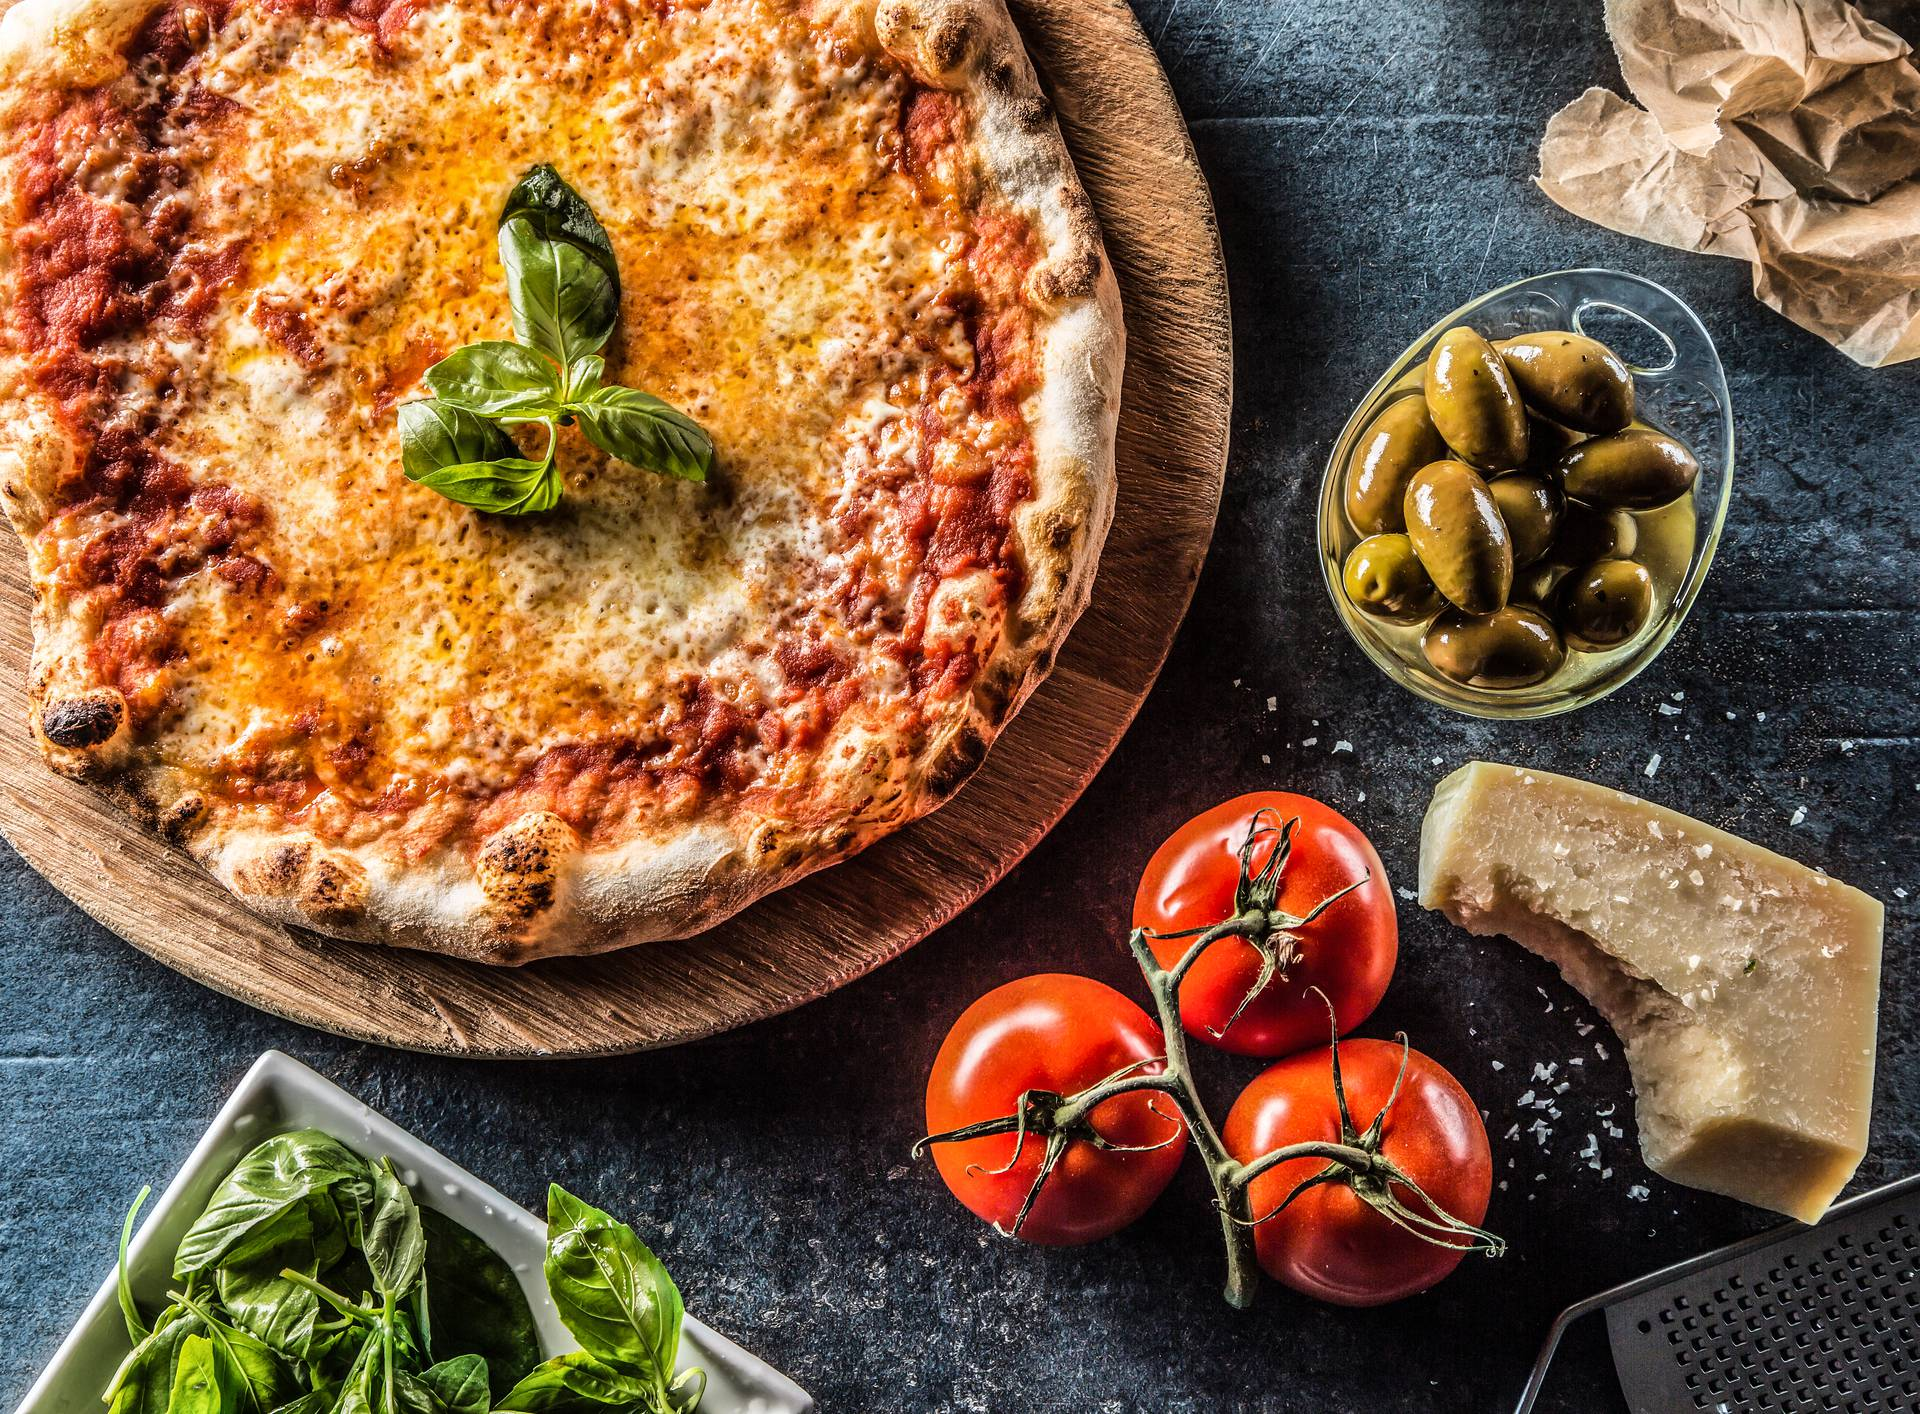 Napravite pizzu Margaritu za prste polizati u samo 8 minuta